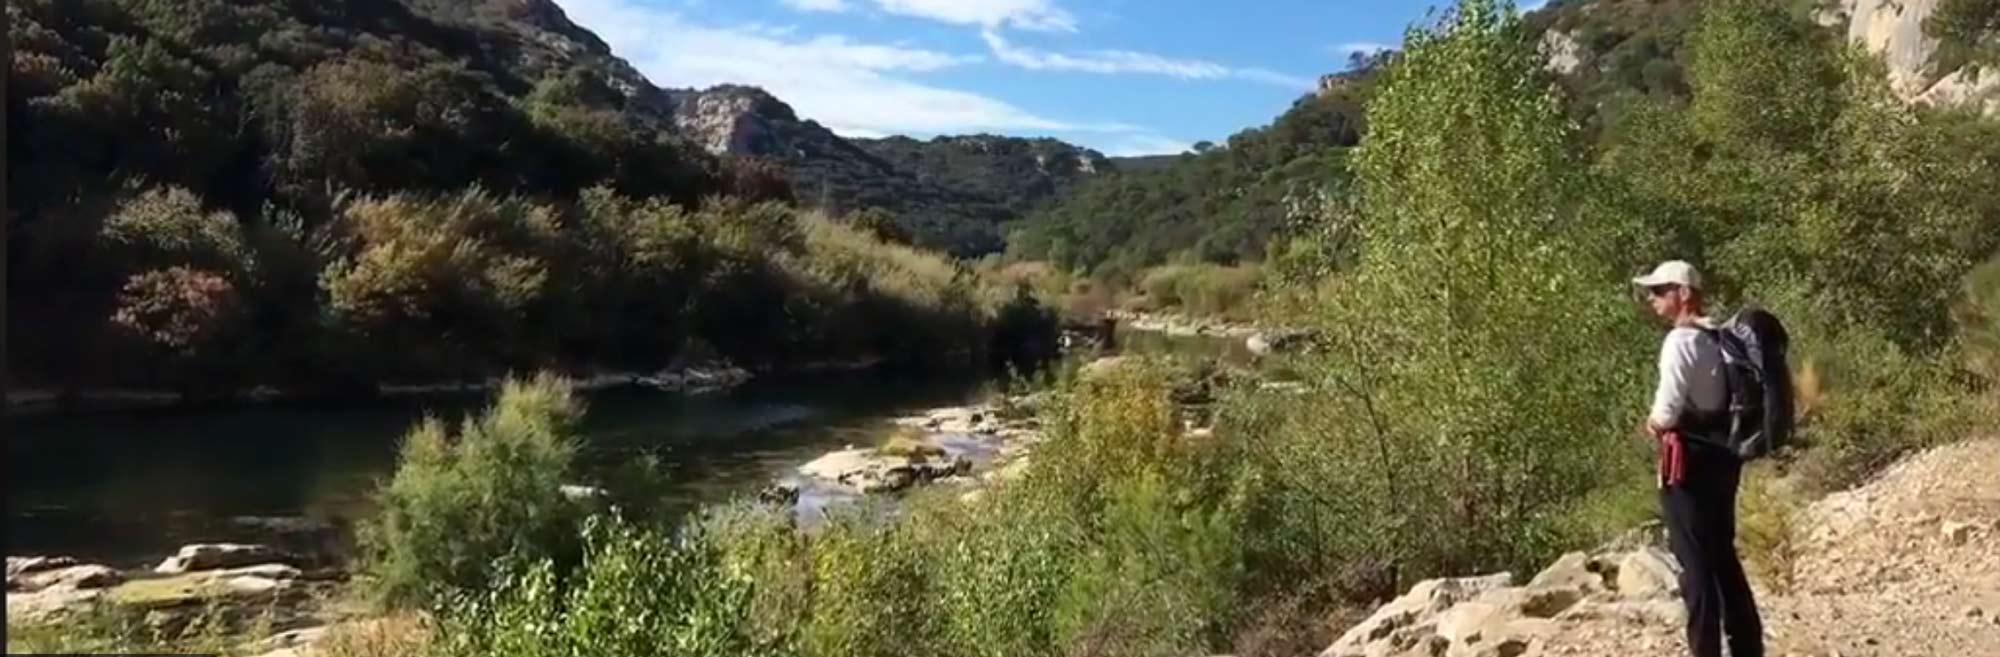 Wanderreise Languedoc